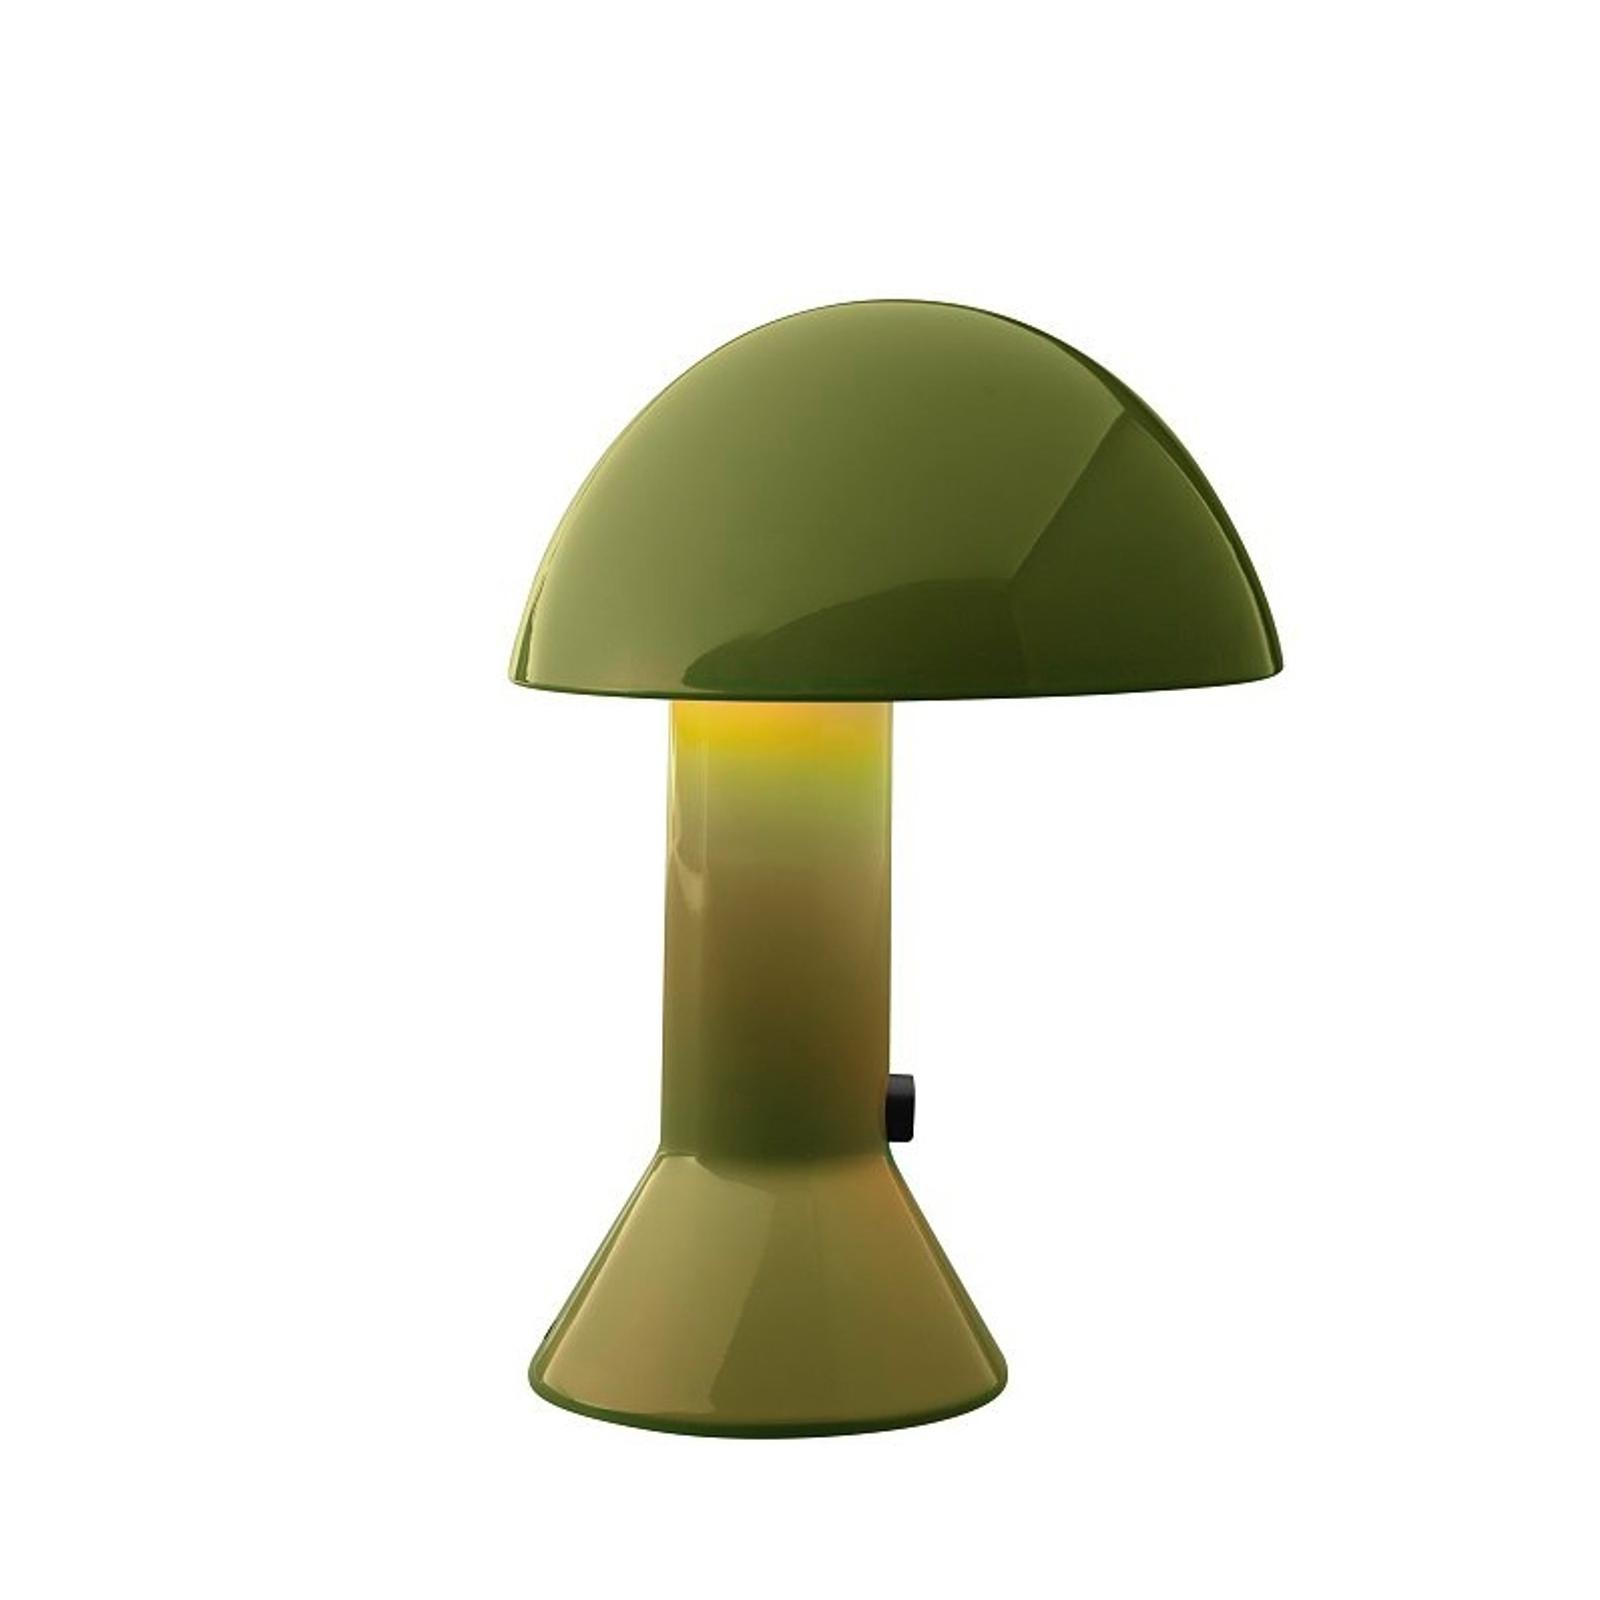 Design-tafellamp ELMETTO, groen